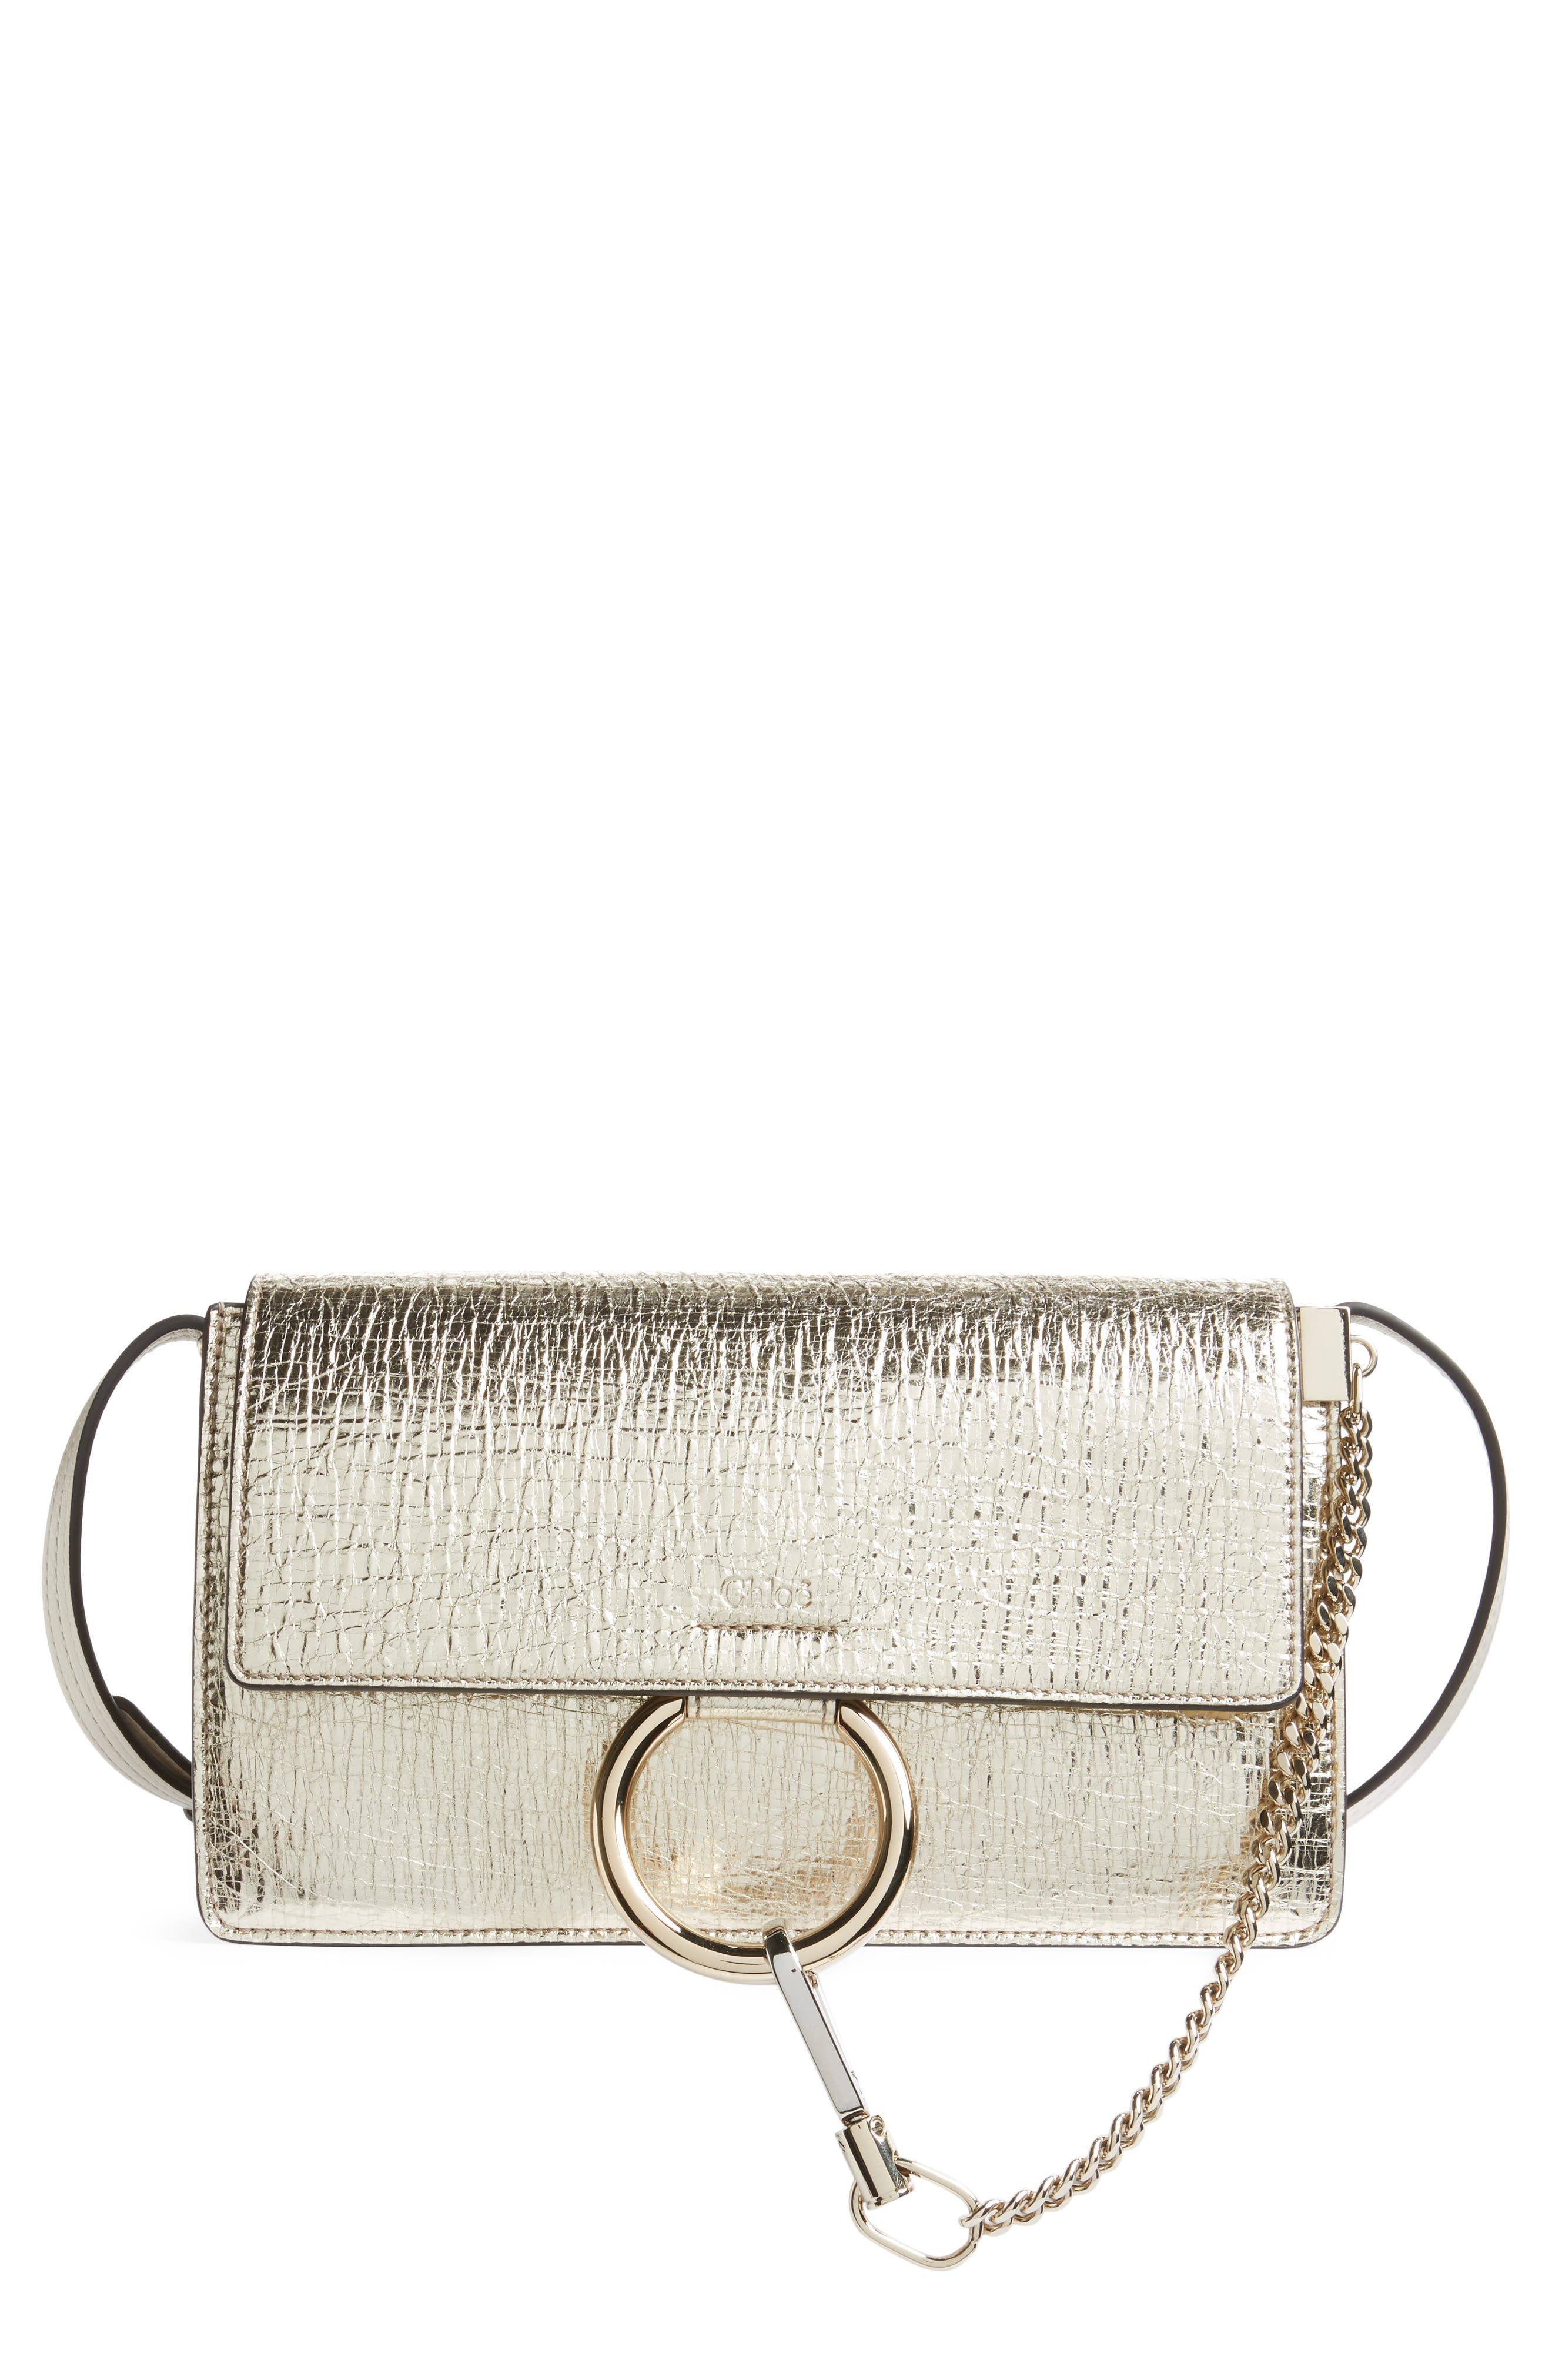 Small Faye Metallic Leather Shoulder Bag,                             Main thumbnail 1, color,                             710